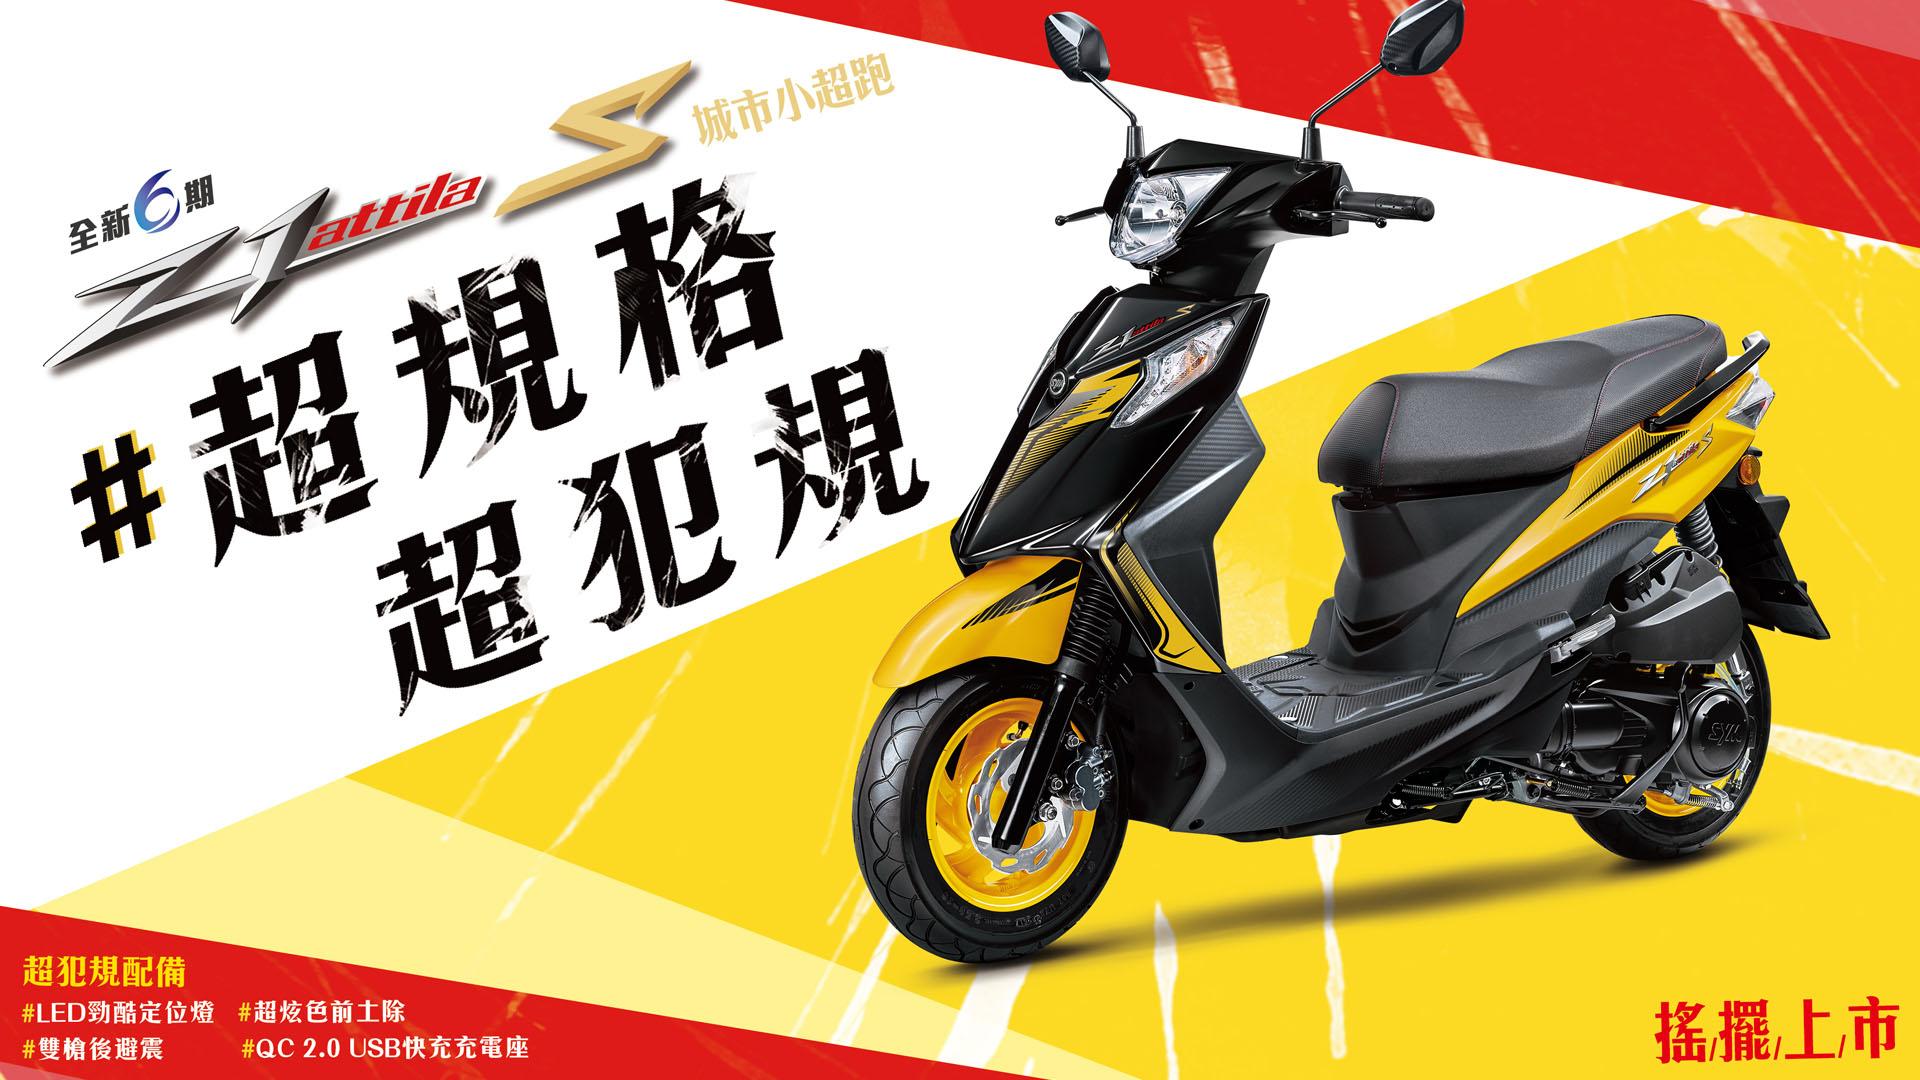 SYM三陽 Z1 ATTILA 125 碟煞